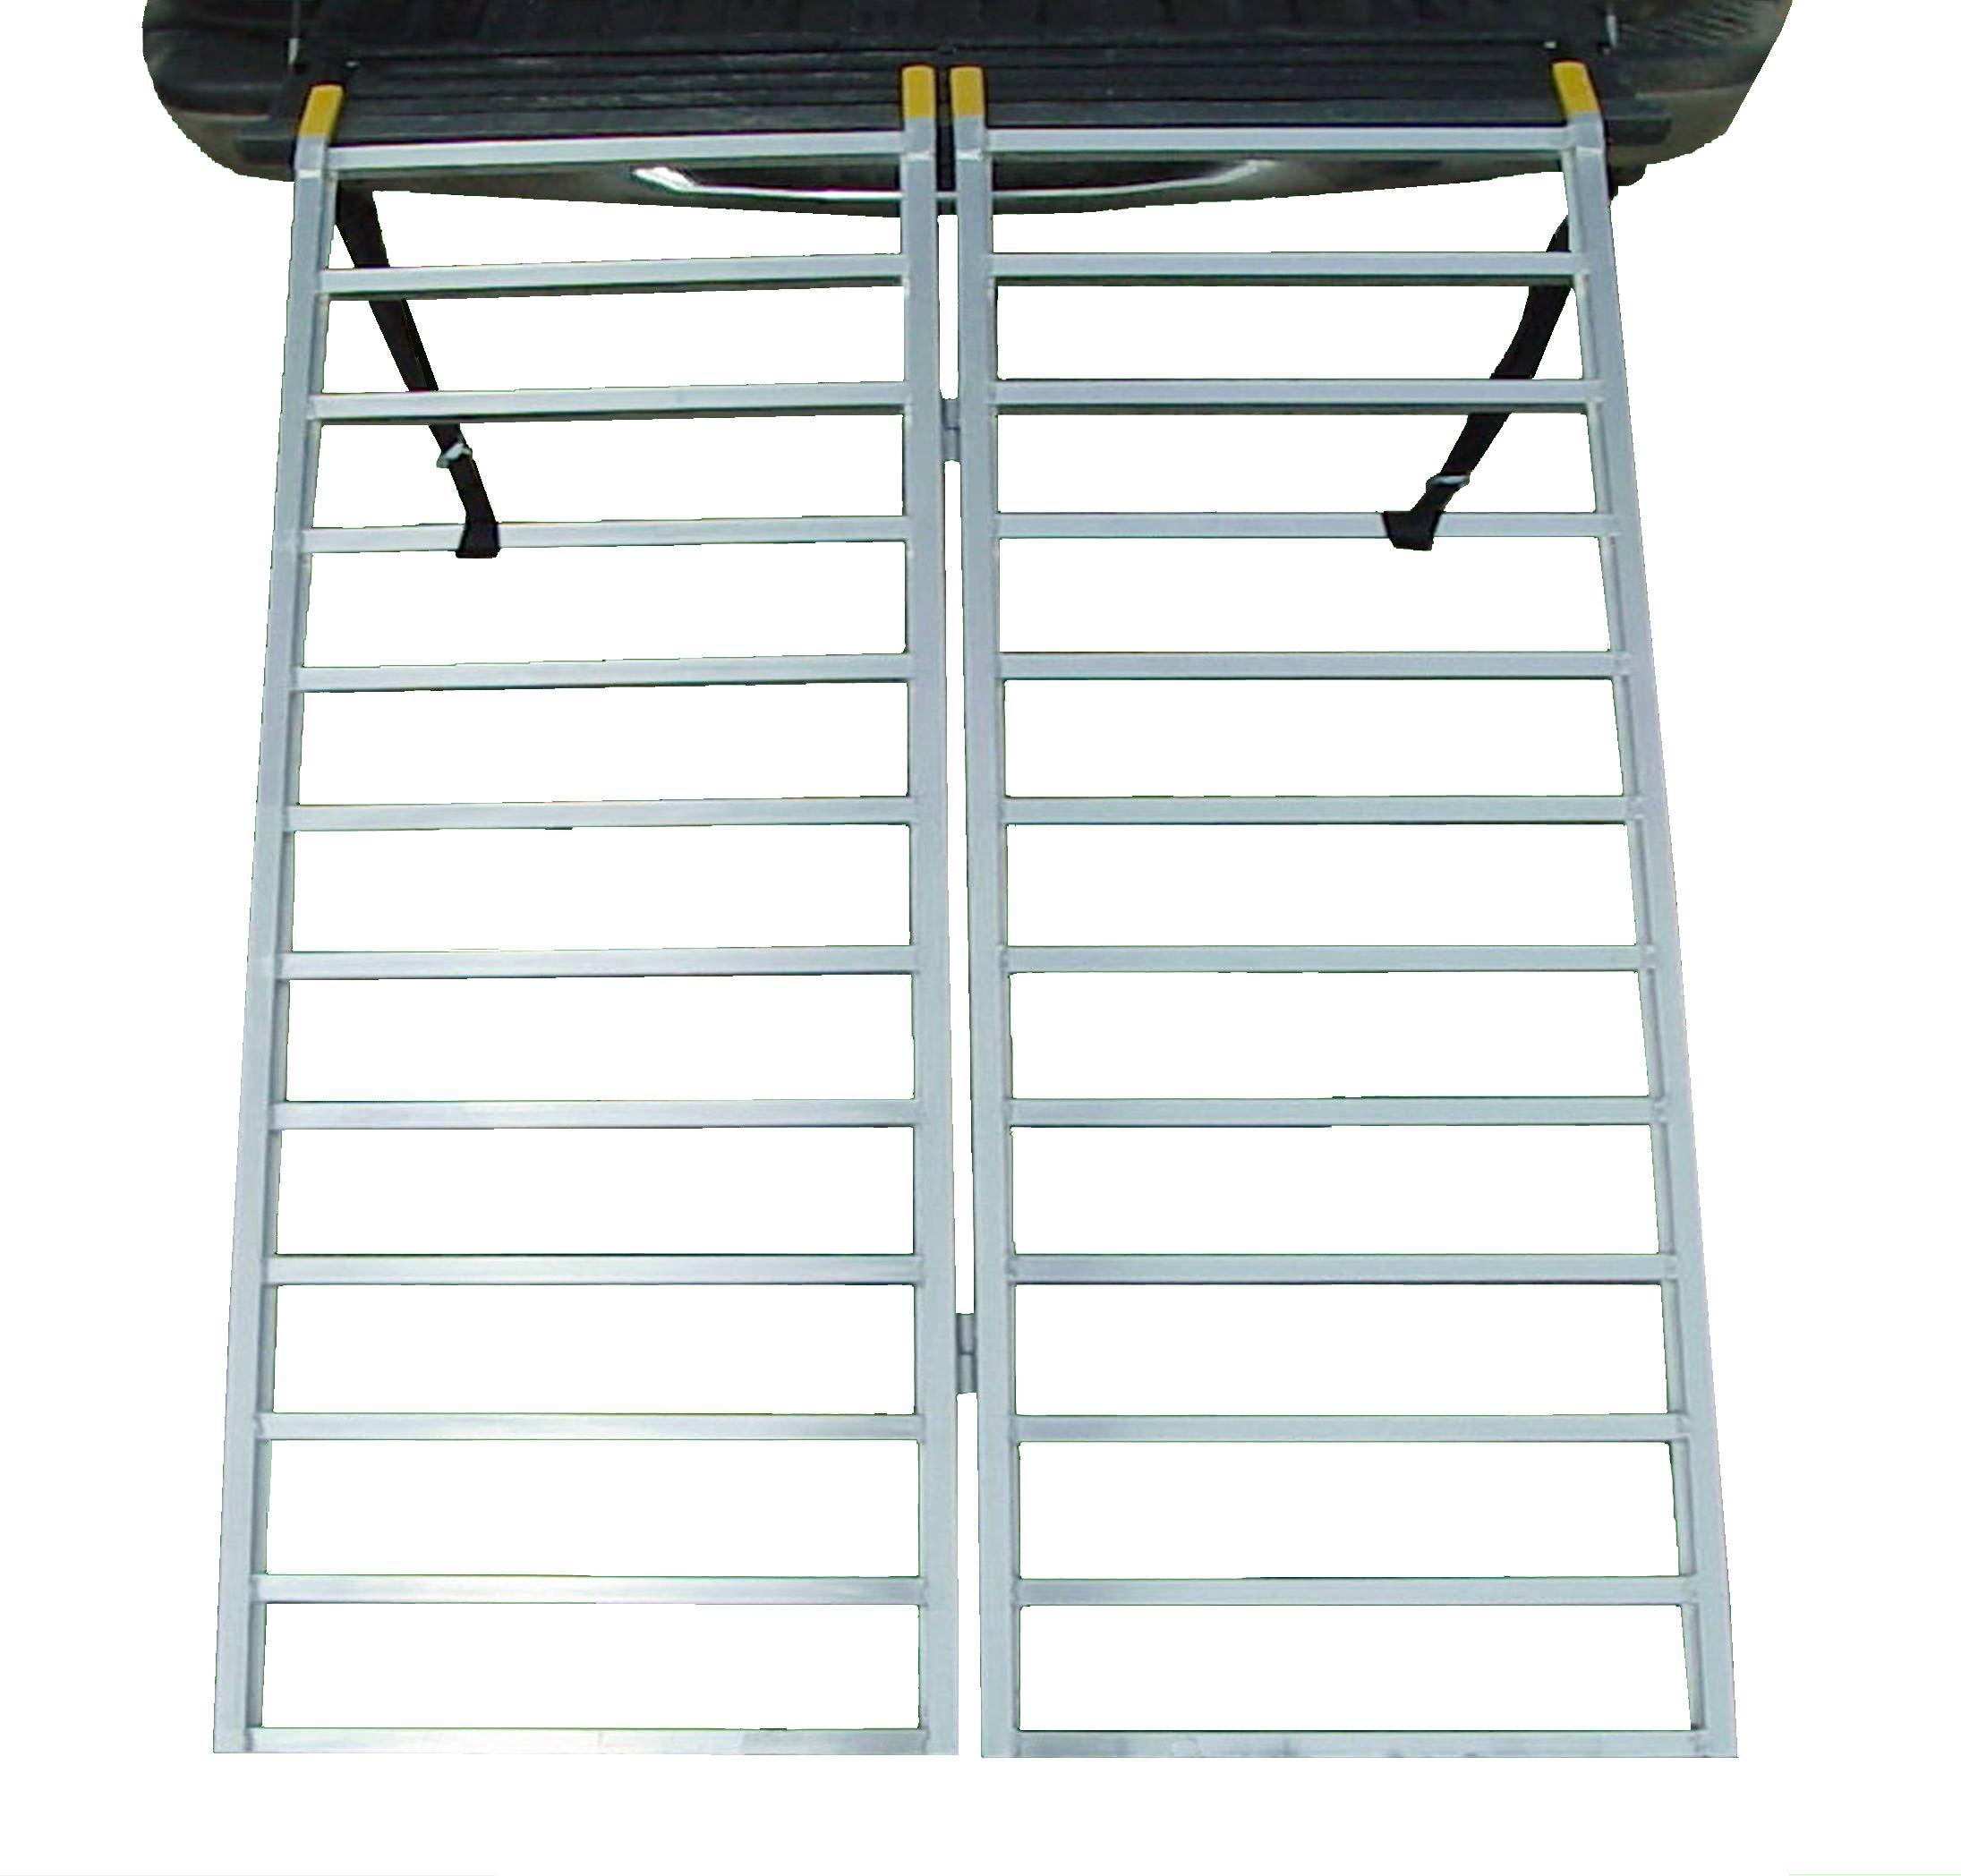 LL46715 Bi Fold Ramp